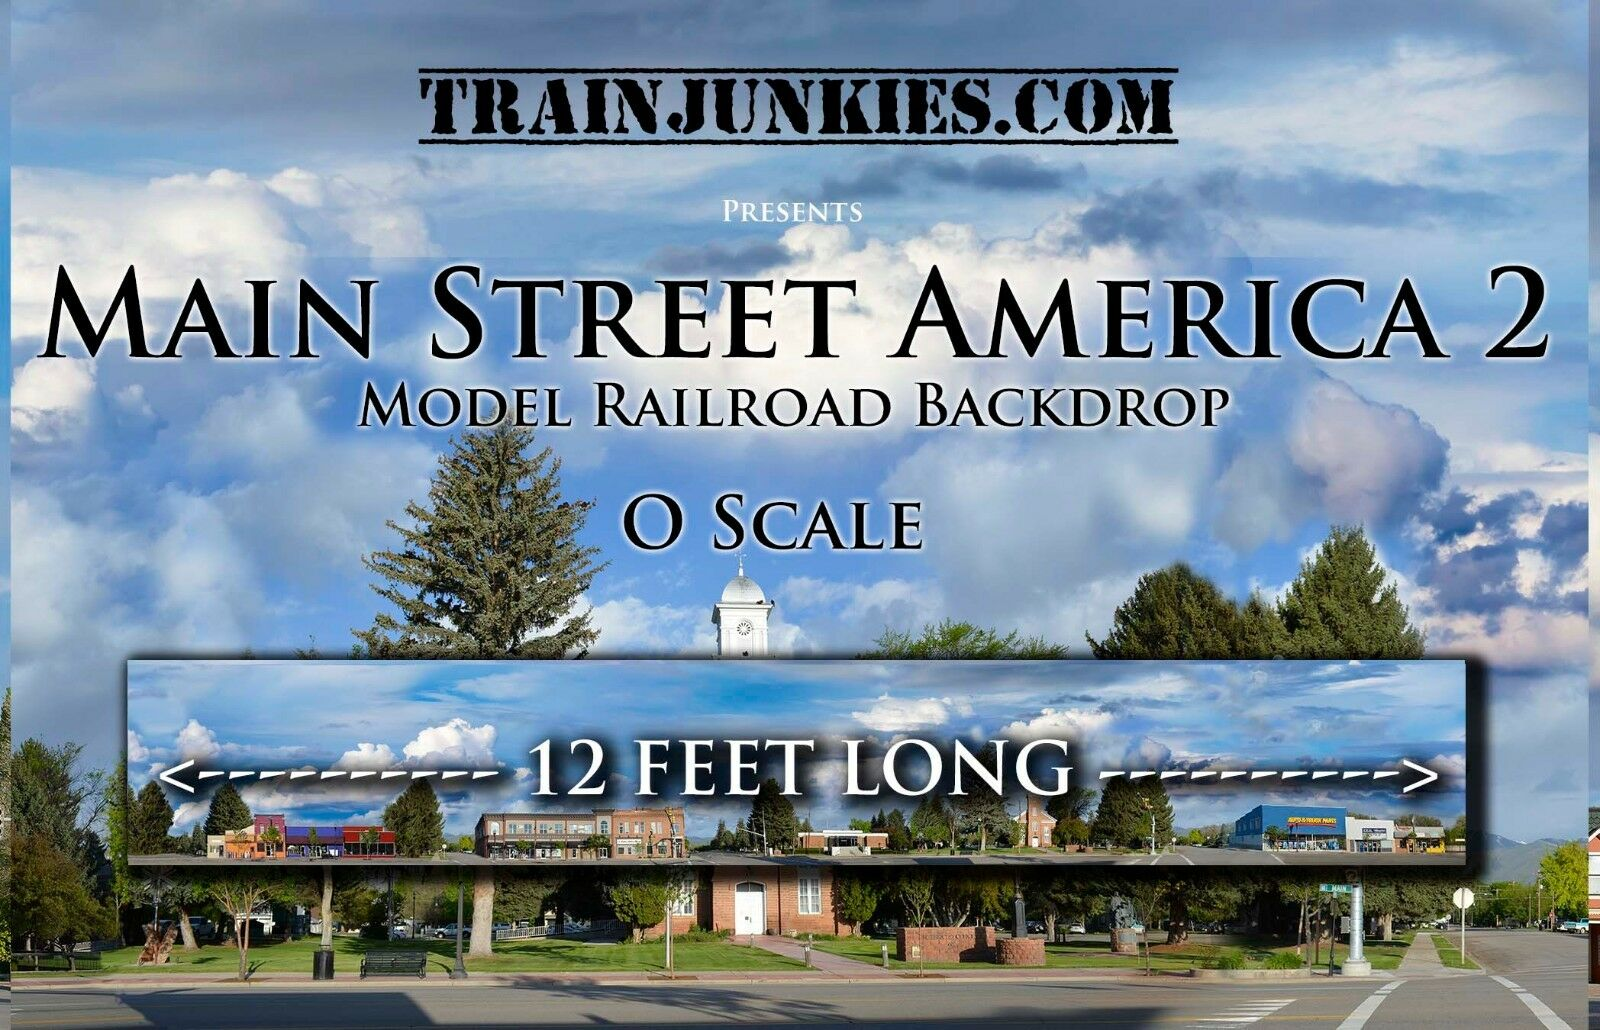 Trainjunkies o escala  Main Street America 2  modelo del ferrocarril telón de fondo 24x144